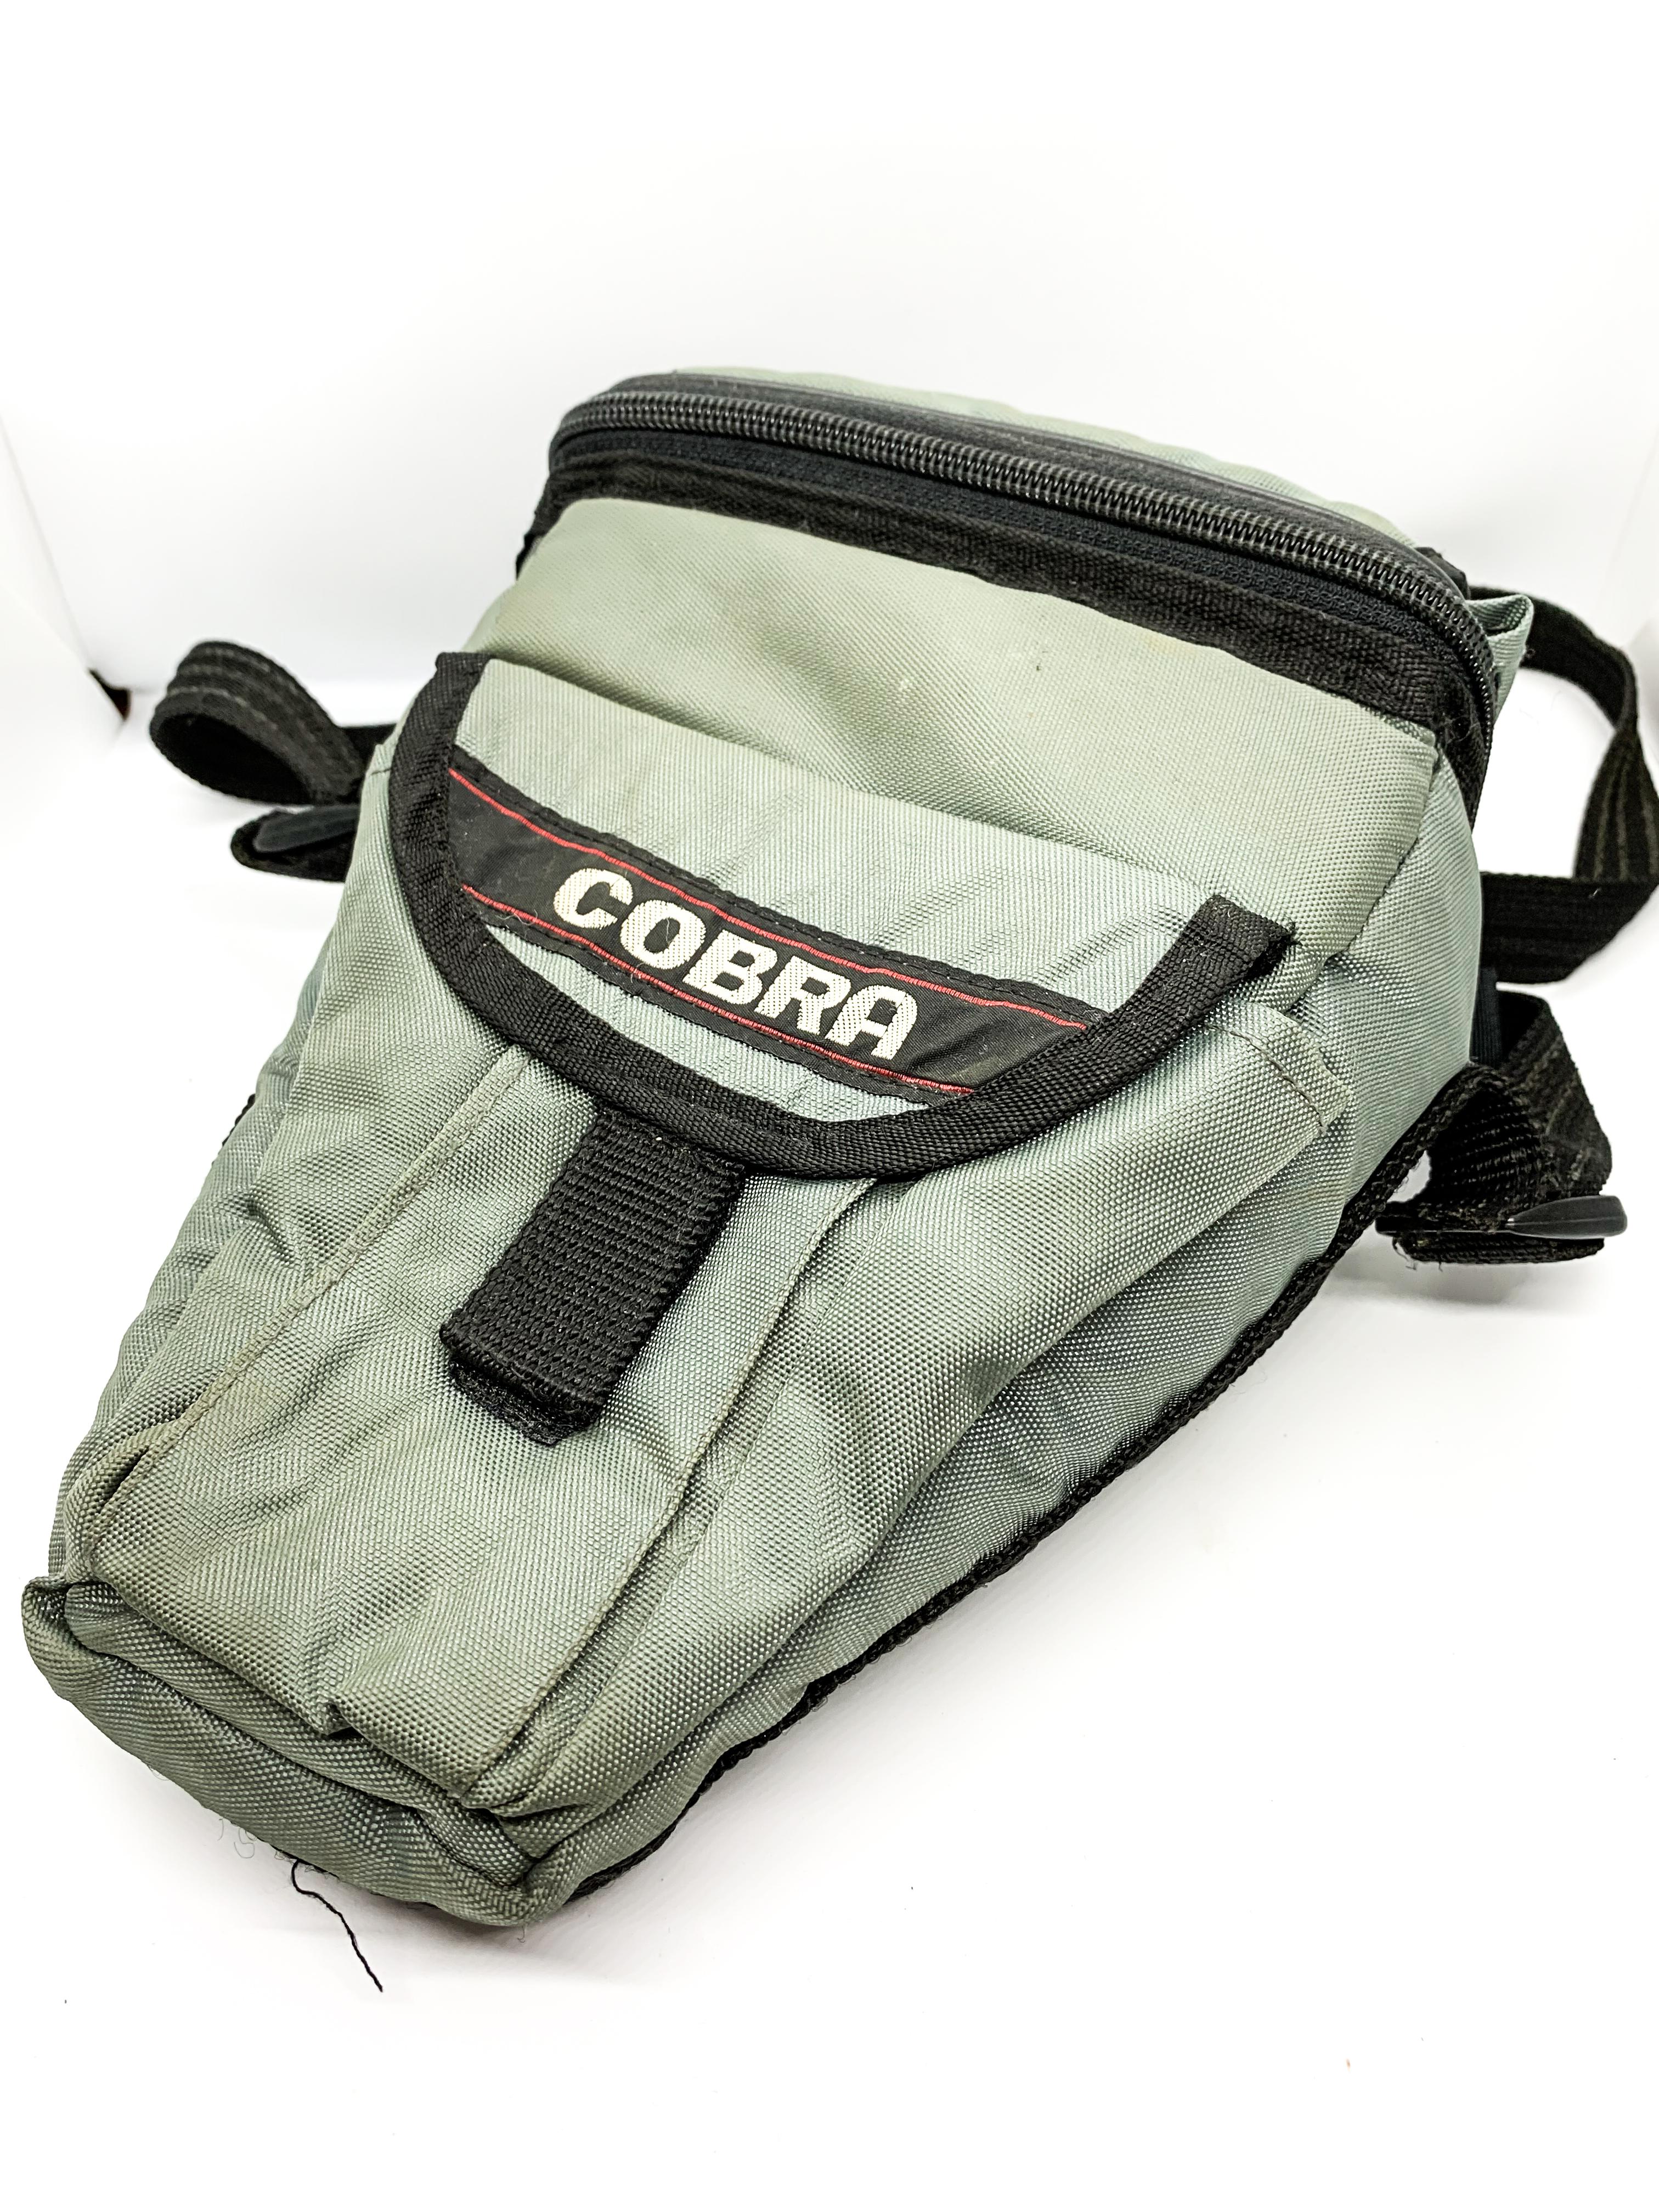 Vintage Cobra Camera Bag